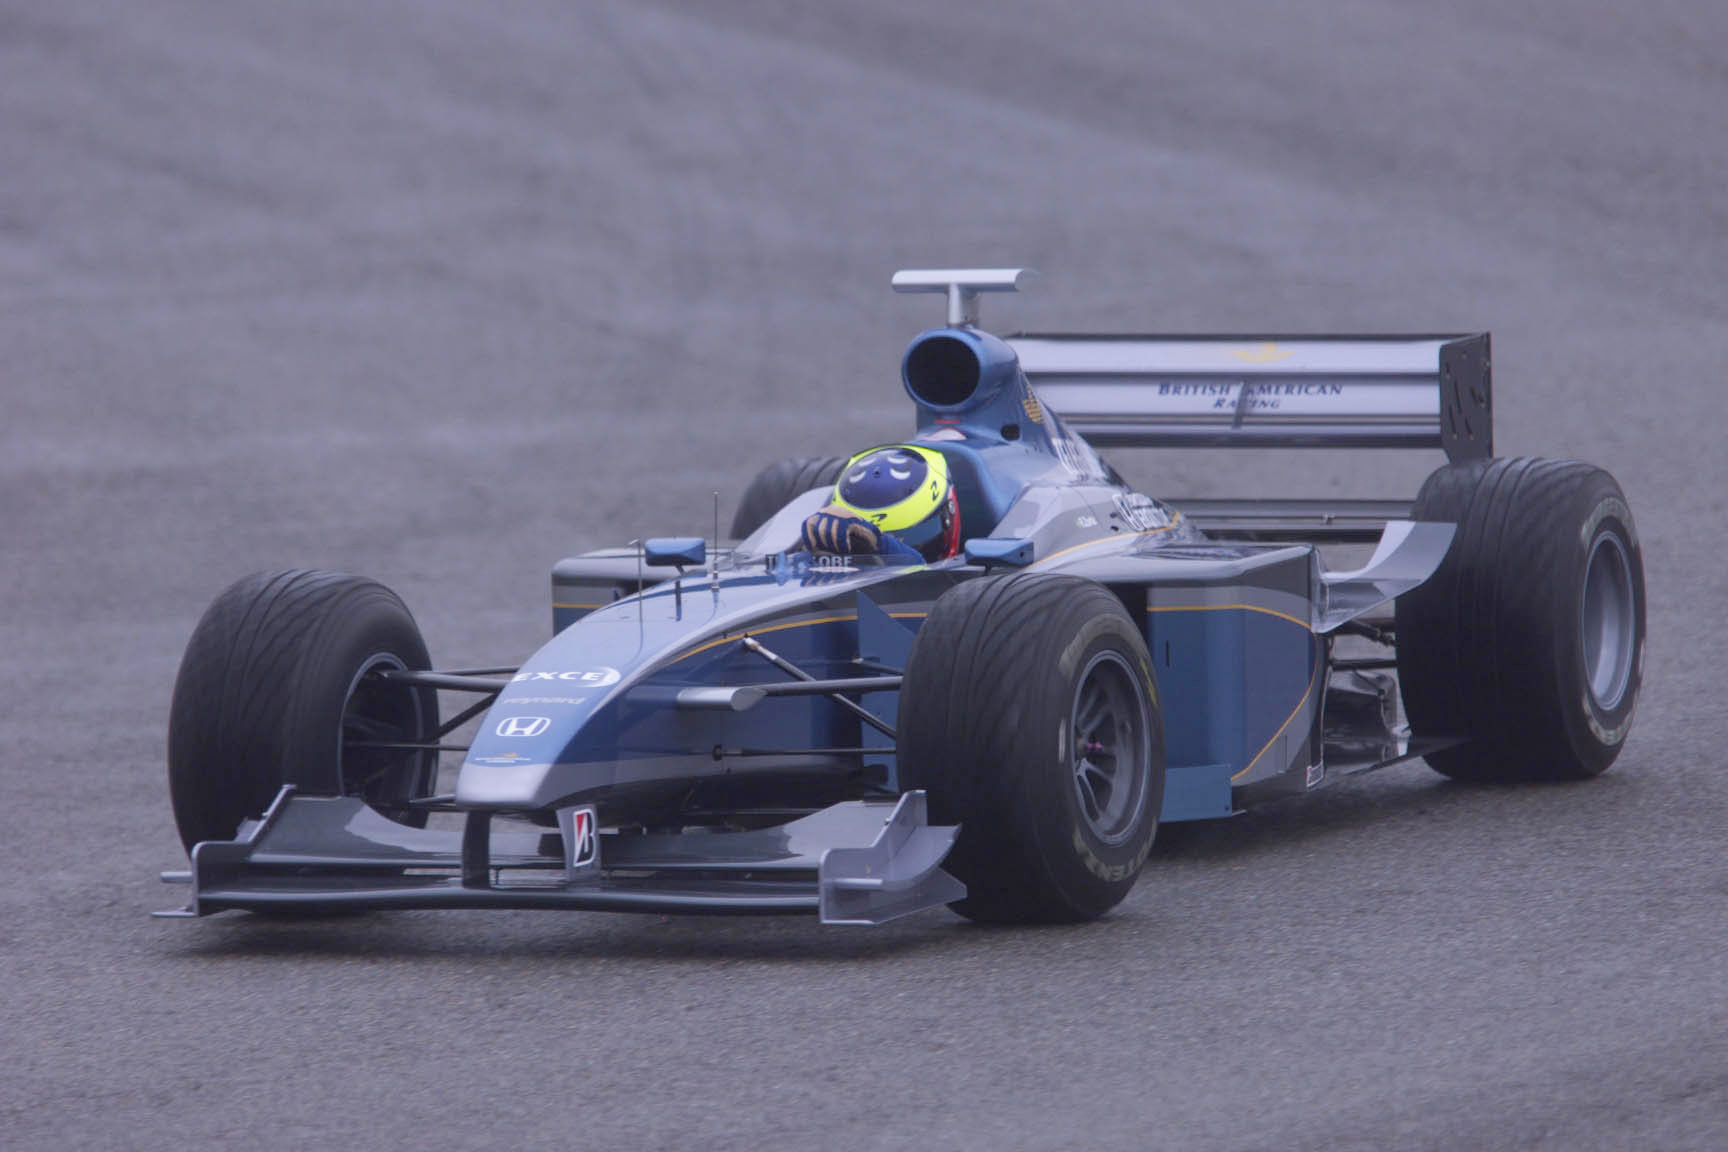 Indy on 2008 Acura Integra